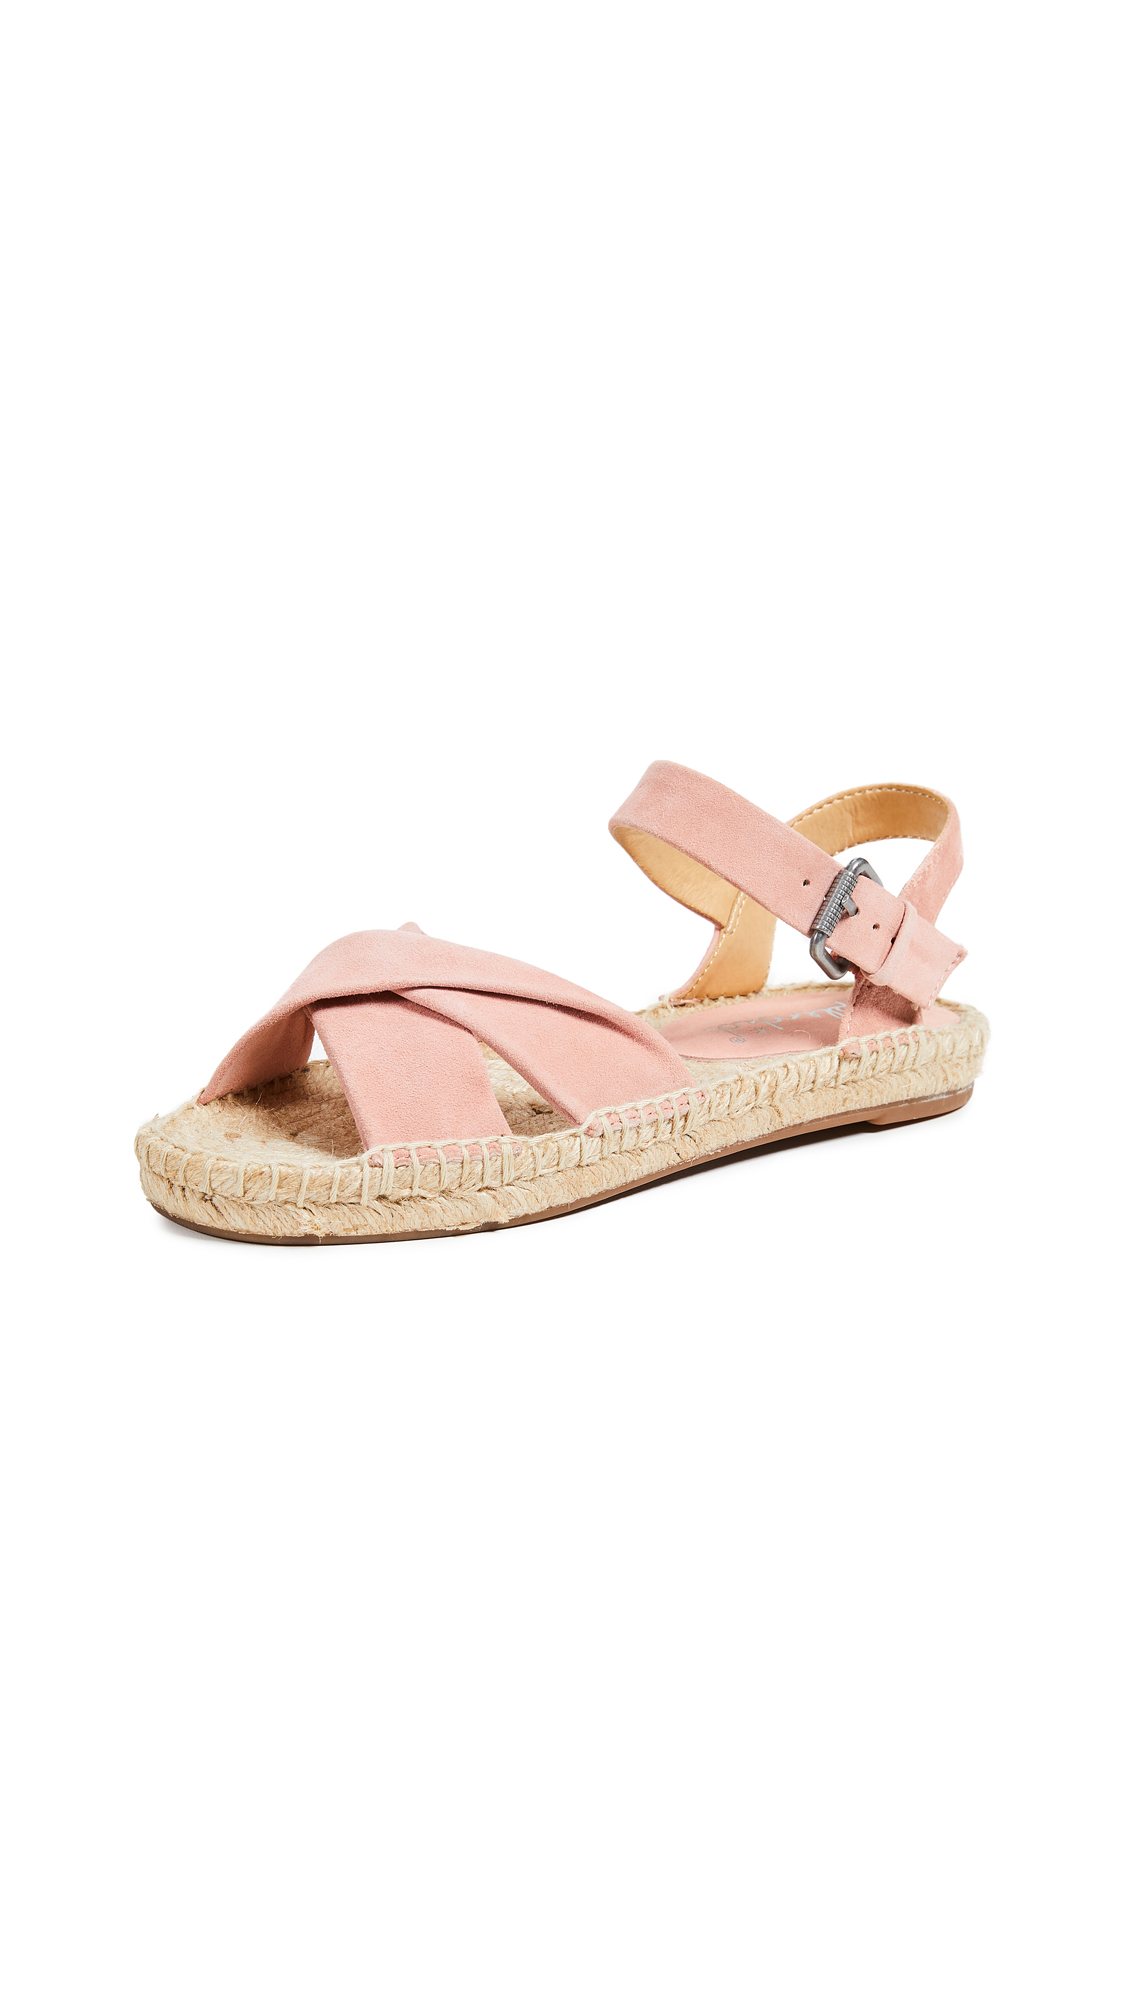 Splendid Fae Espadrille Sandals - Blush